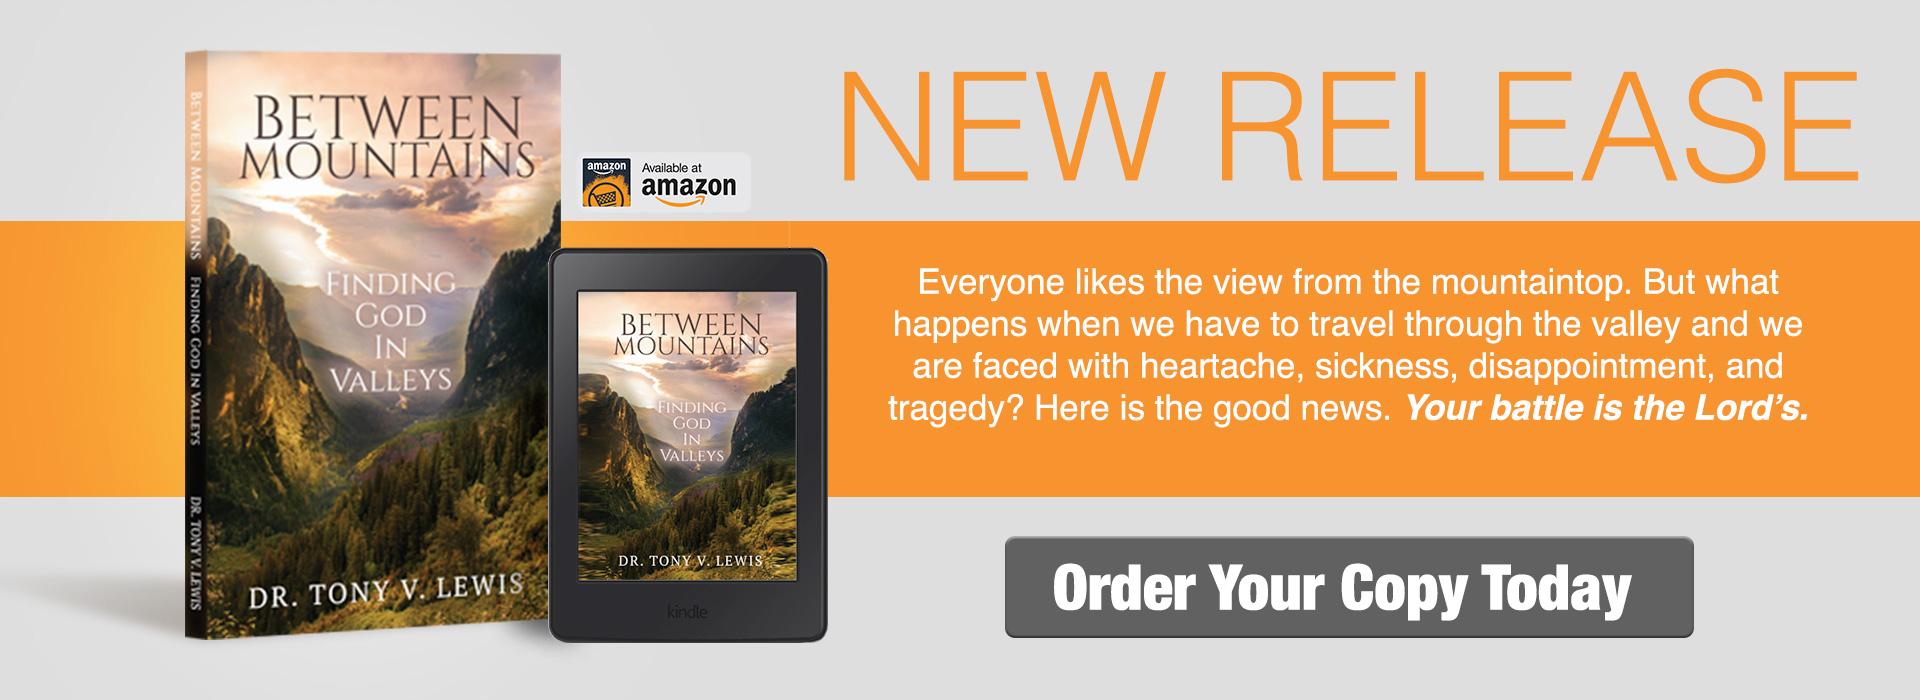 Between Mountains Book Launch